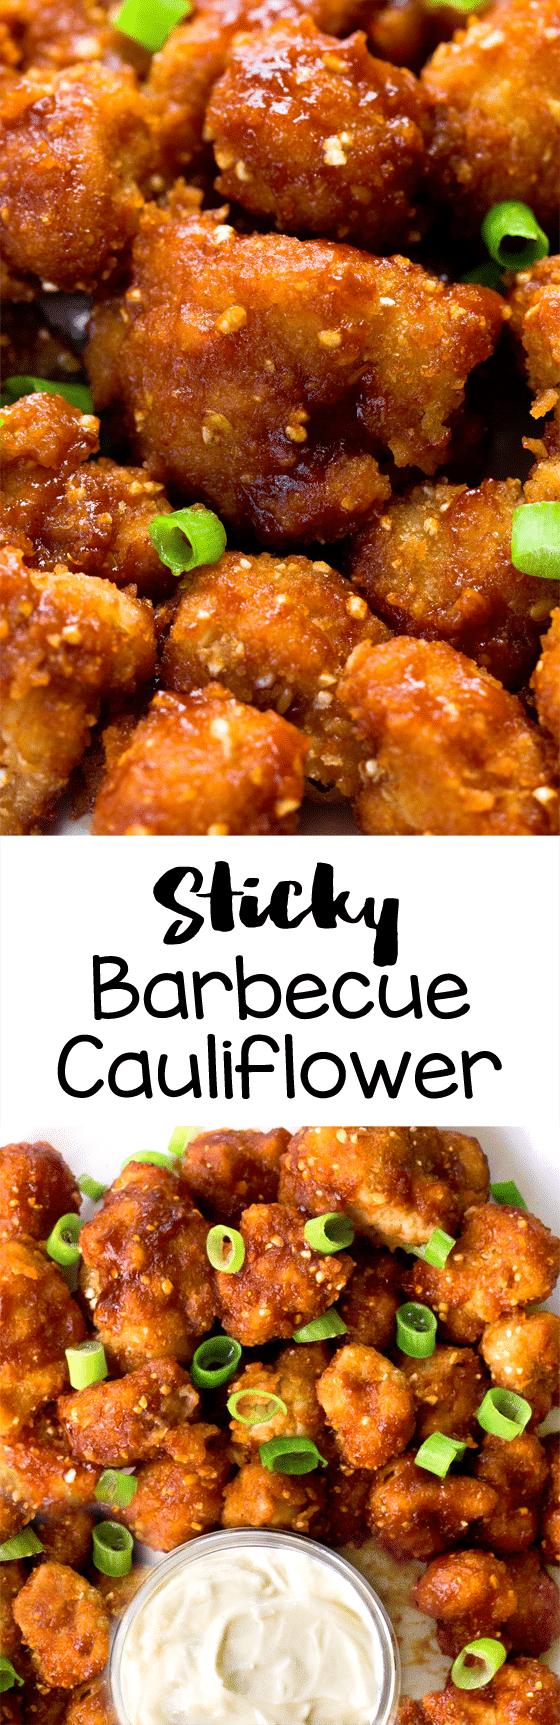 Sticky Barbecue Cauliflower Dinner Recipe